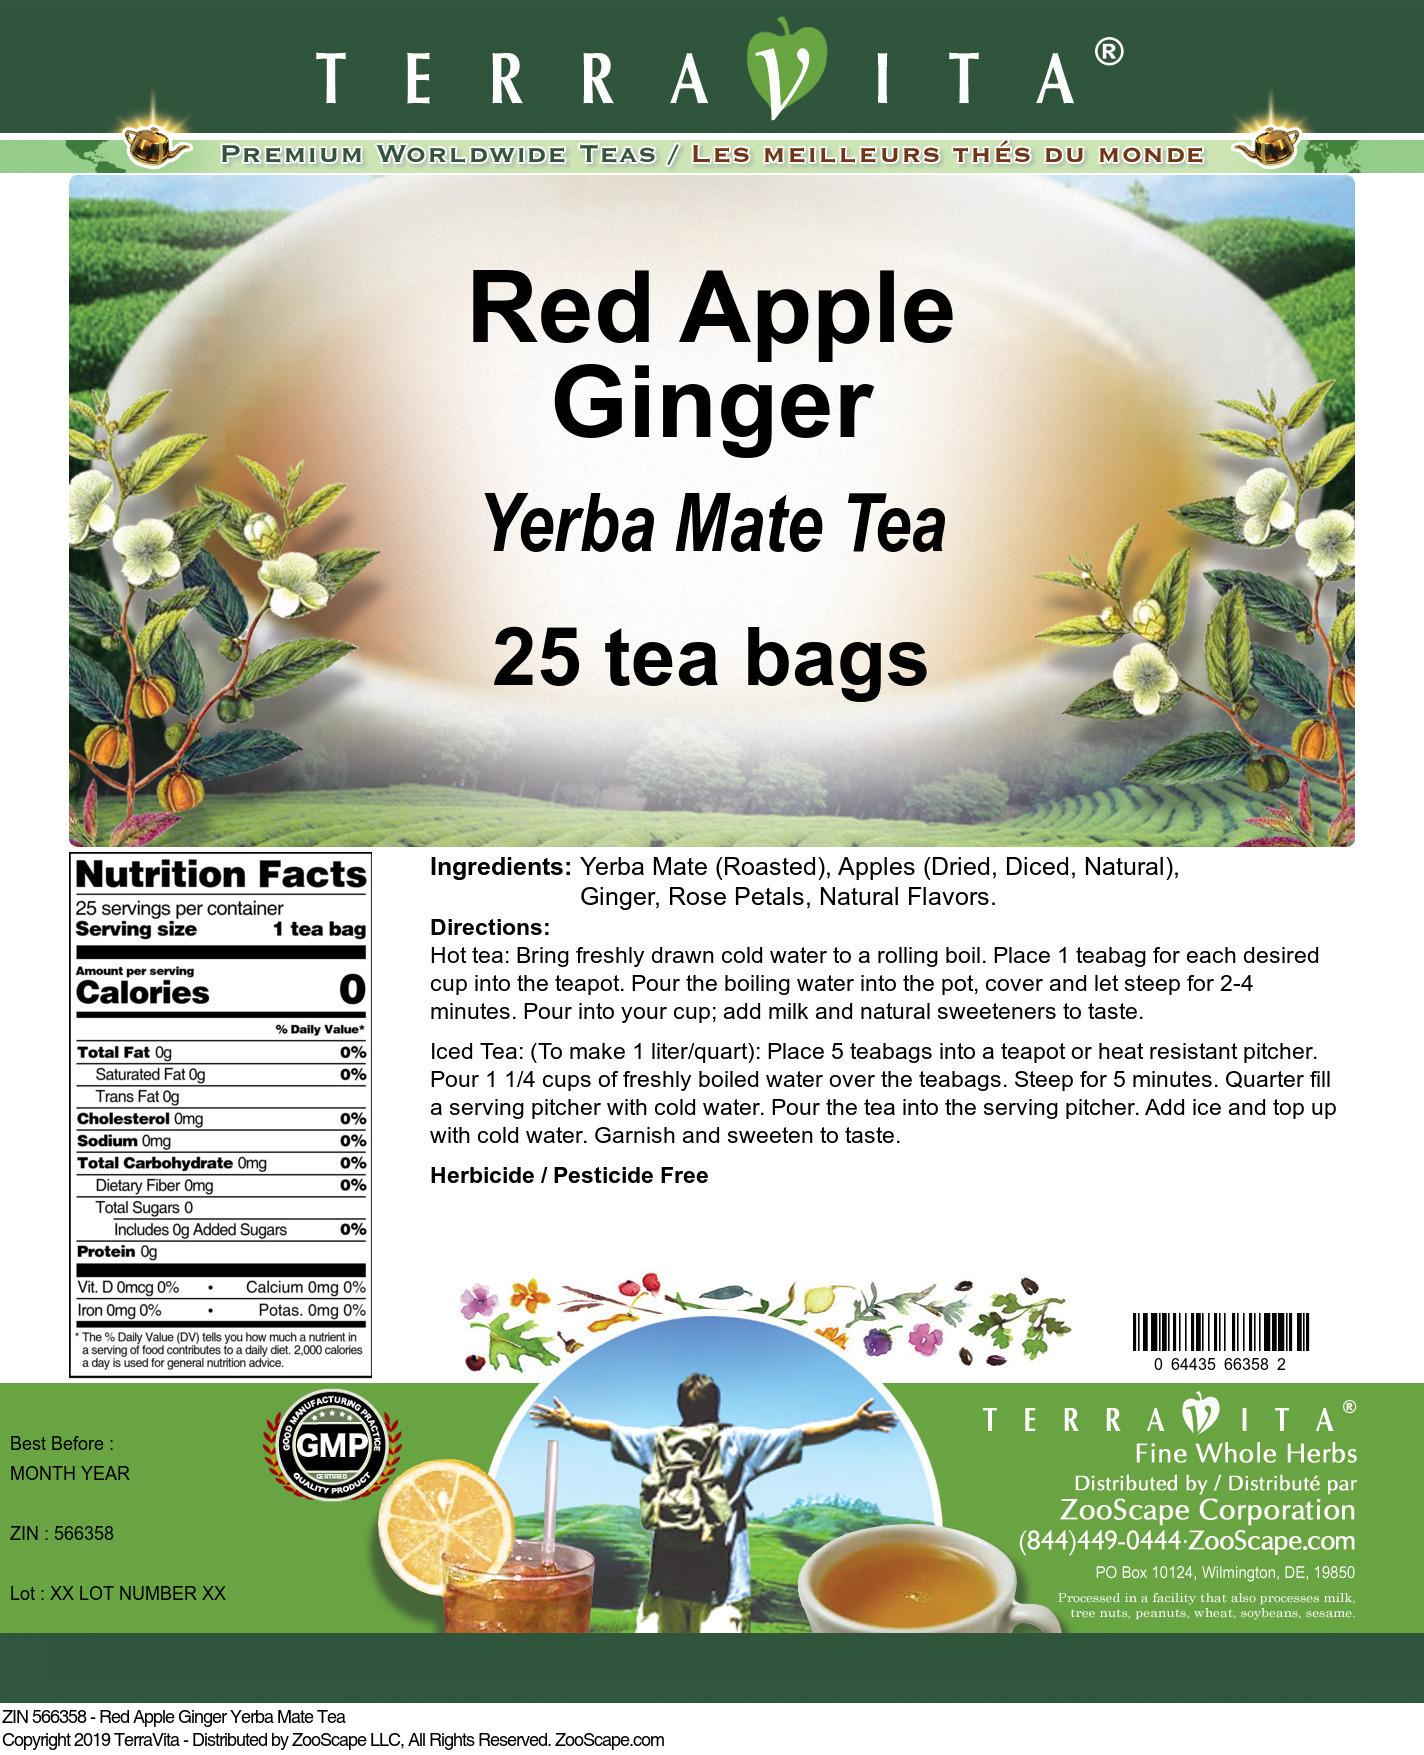 Red Apple Ginger Yerba Mate Tea